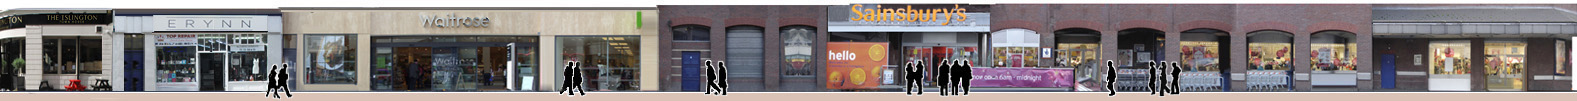 Shops on Liverpool Road Islington